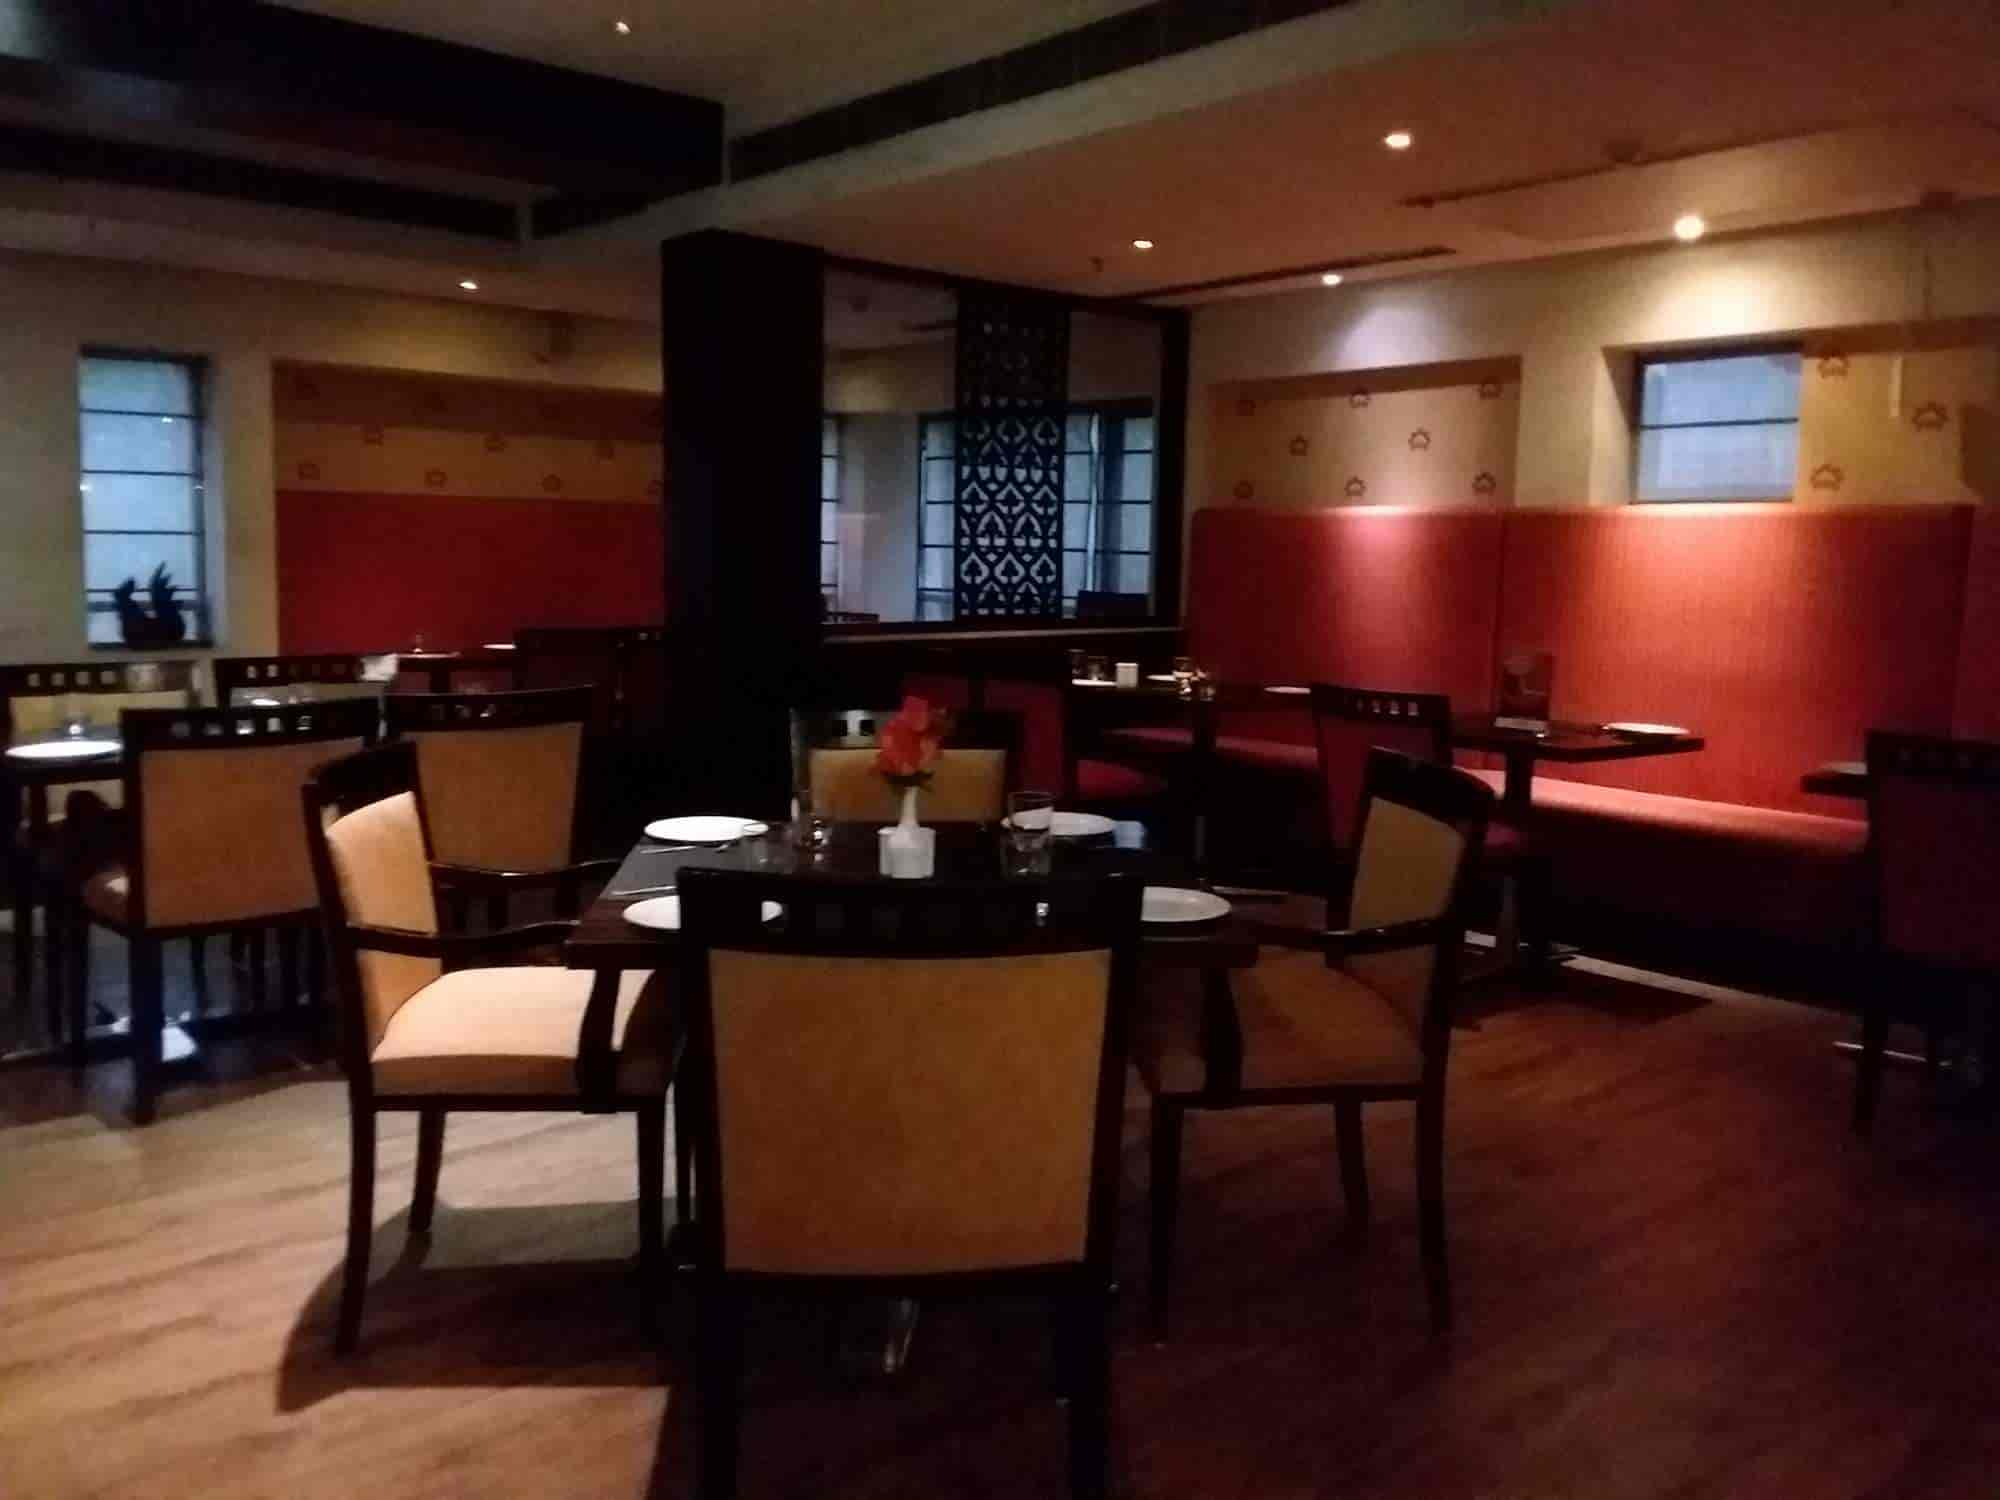 Bellagio Restaurant Ashok Vihar 2 Delhi Chinese Indian Pan Asian Cuisine Restaurant Justdial